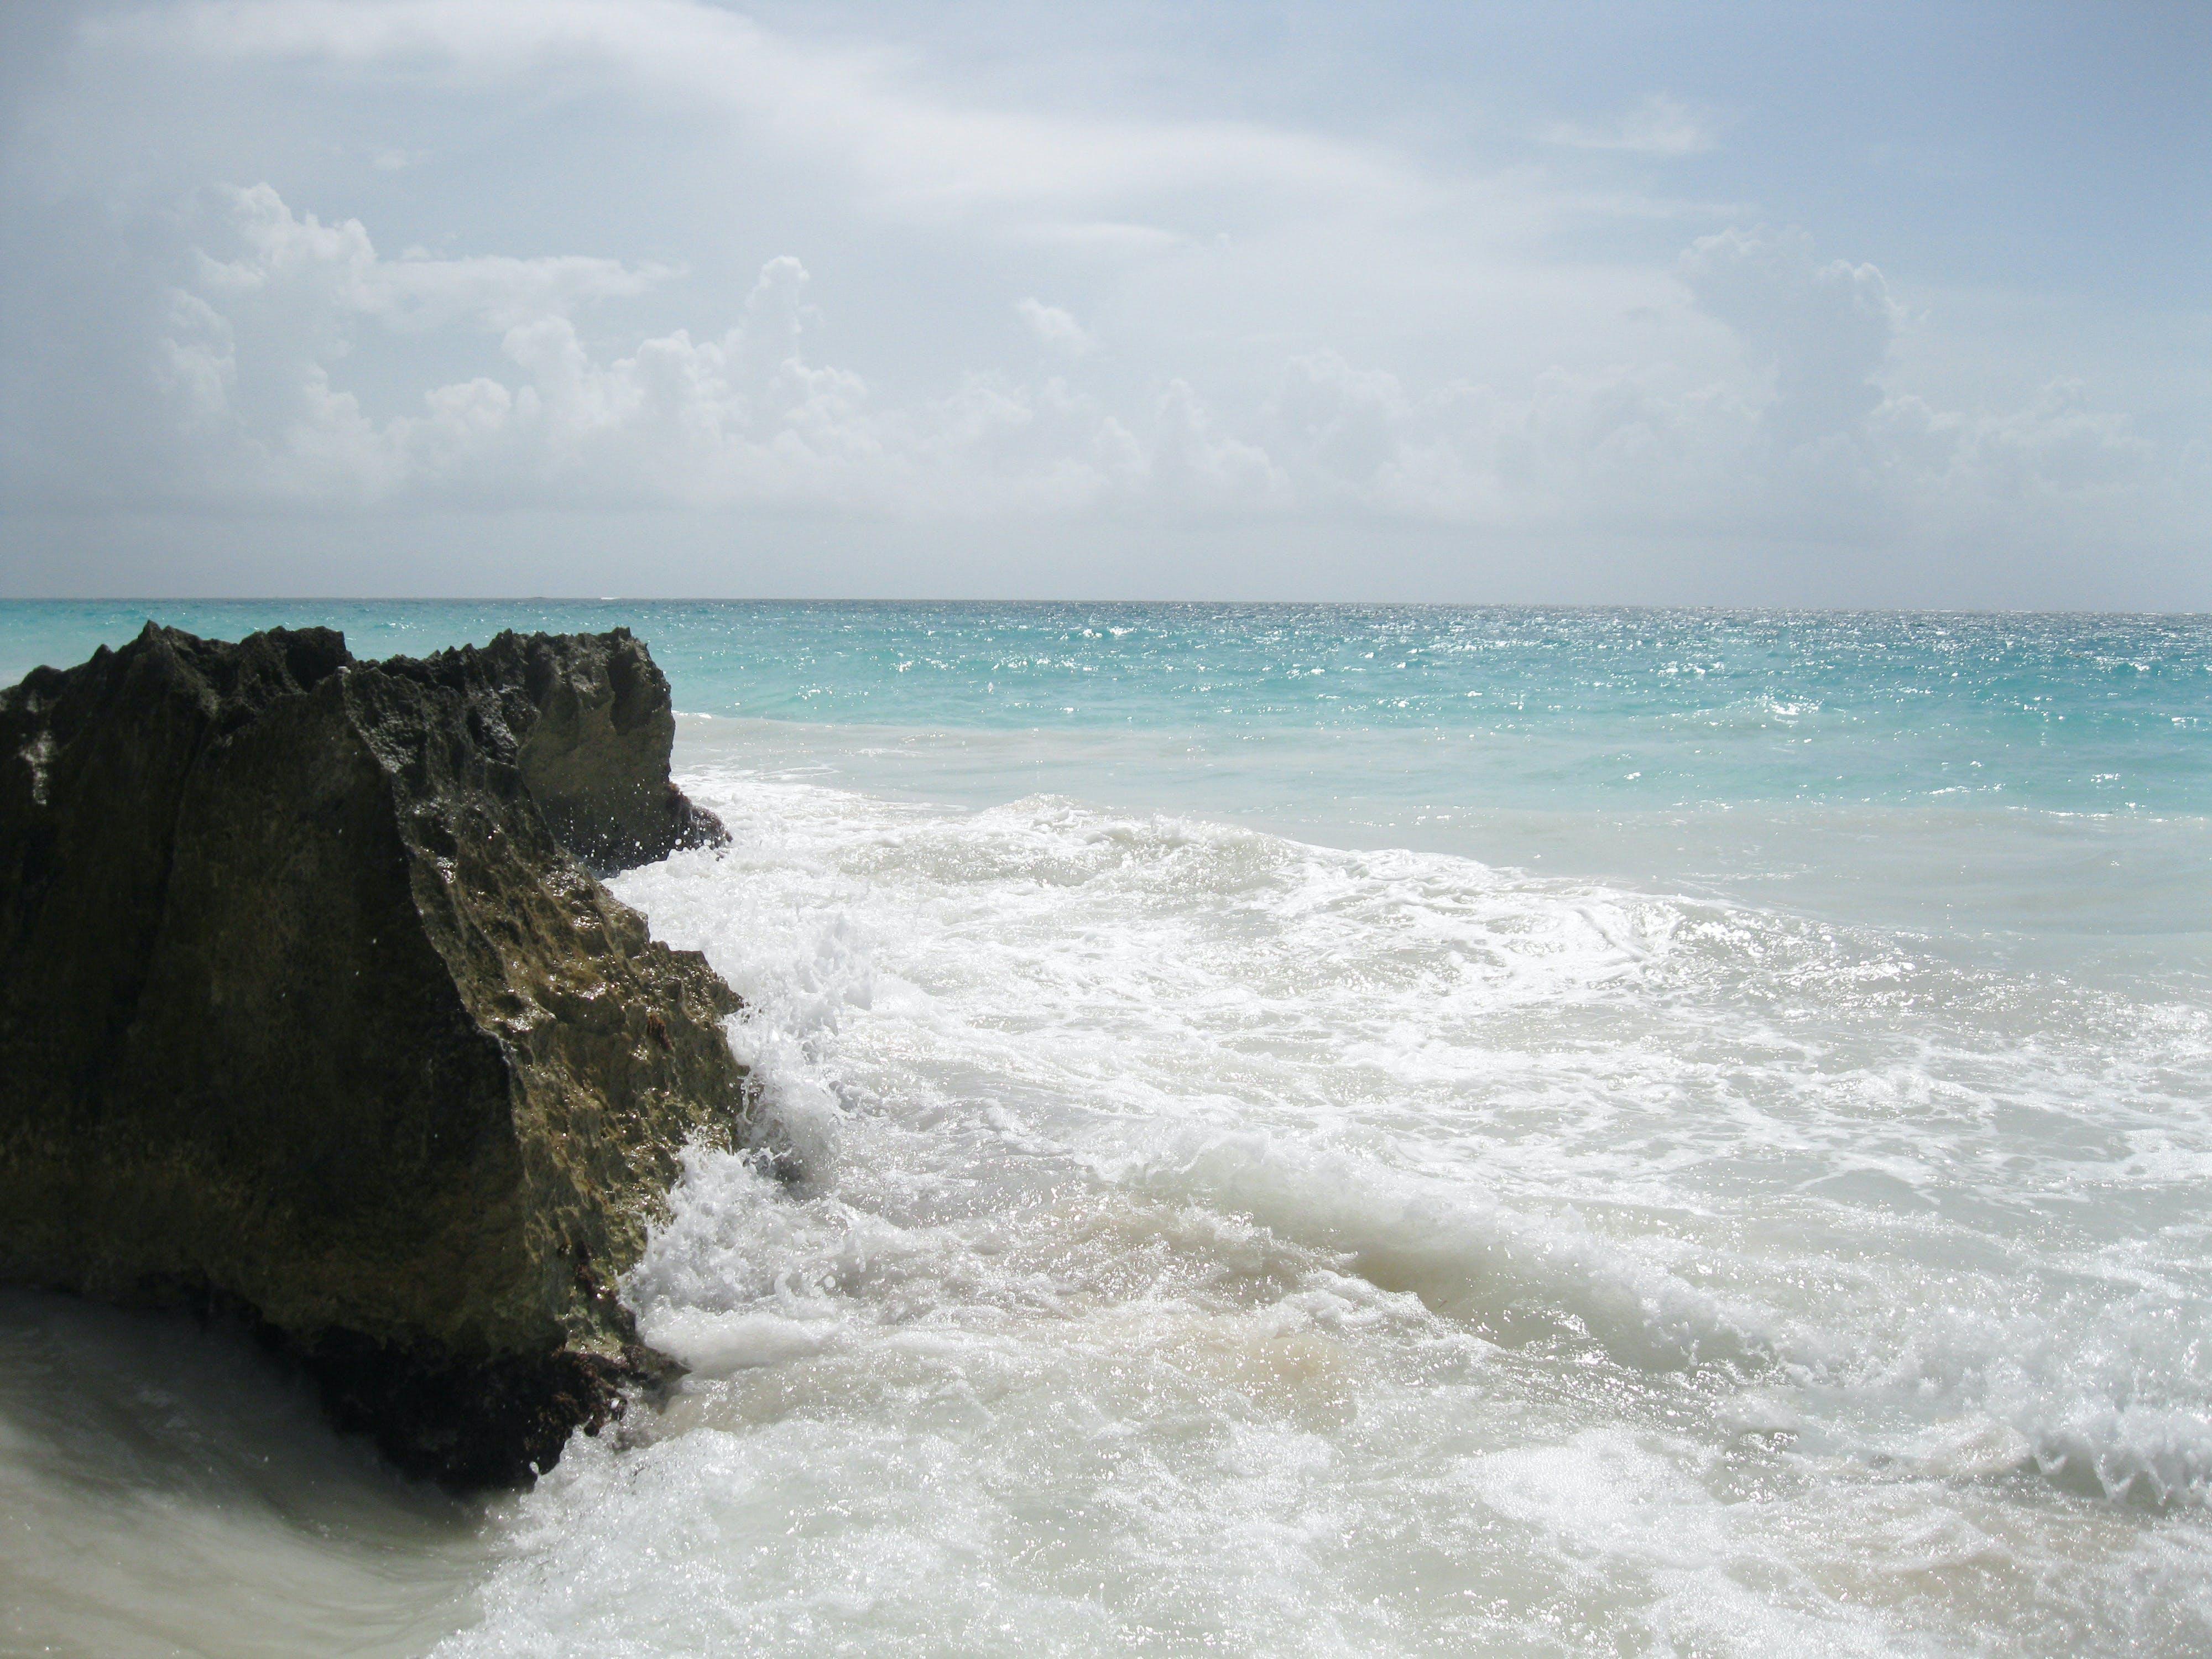 Free stock photo of beach, sand, water, rock